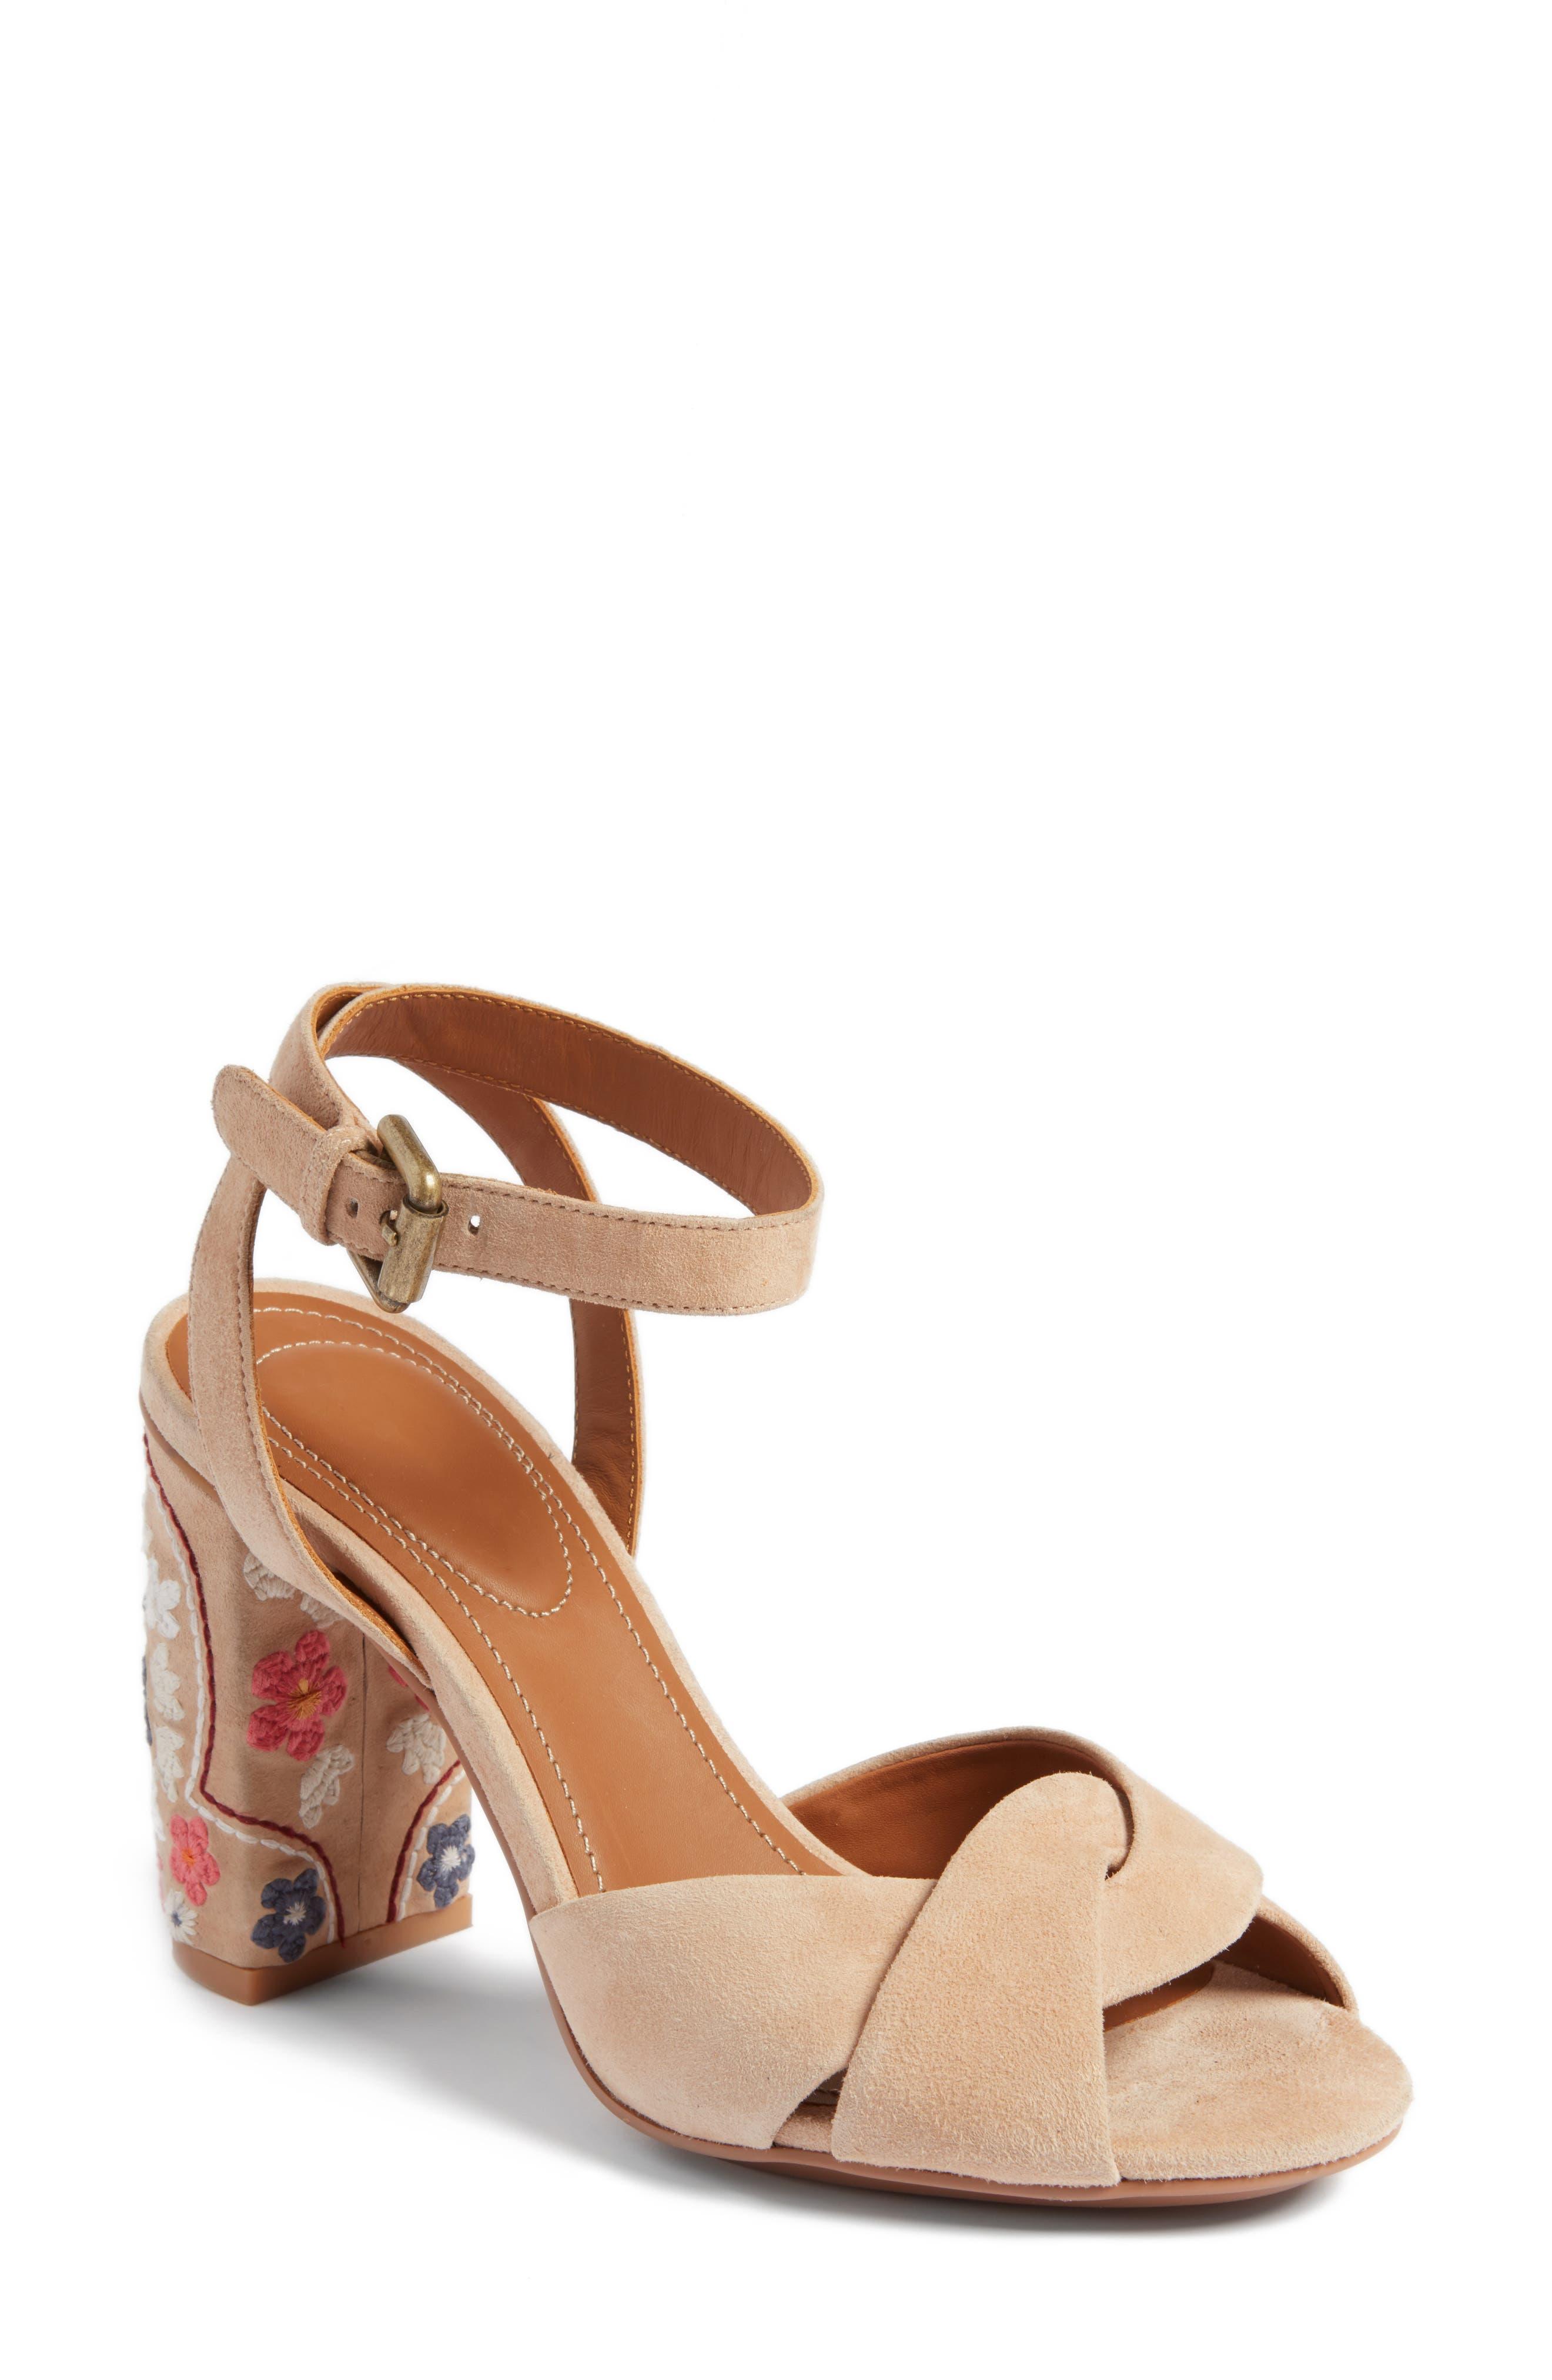 Gayla Embroidered Block Heel Sandal,                             Main thumbnail 1, color,                             Nude